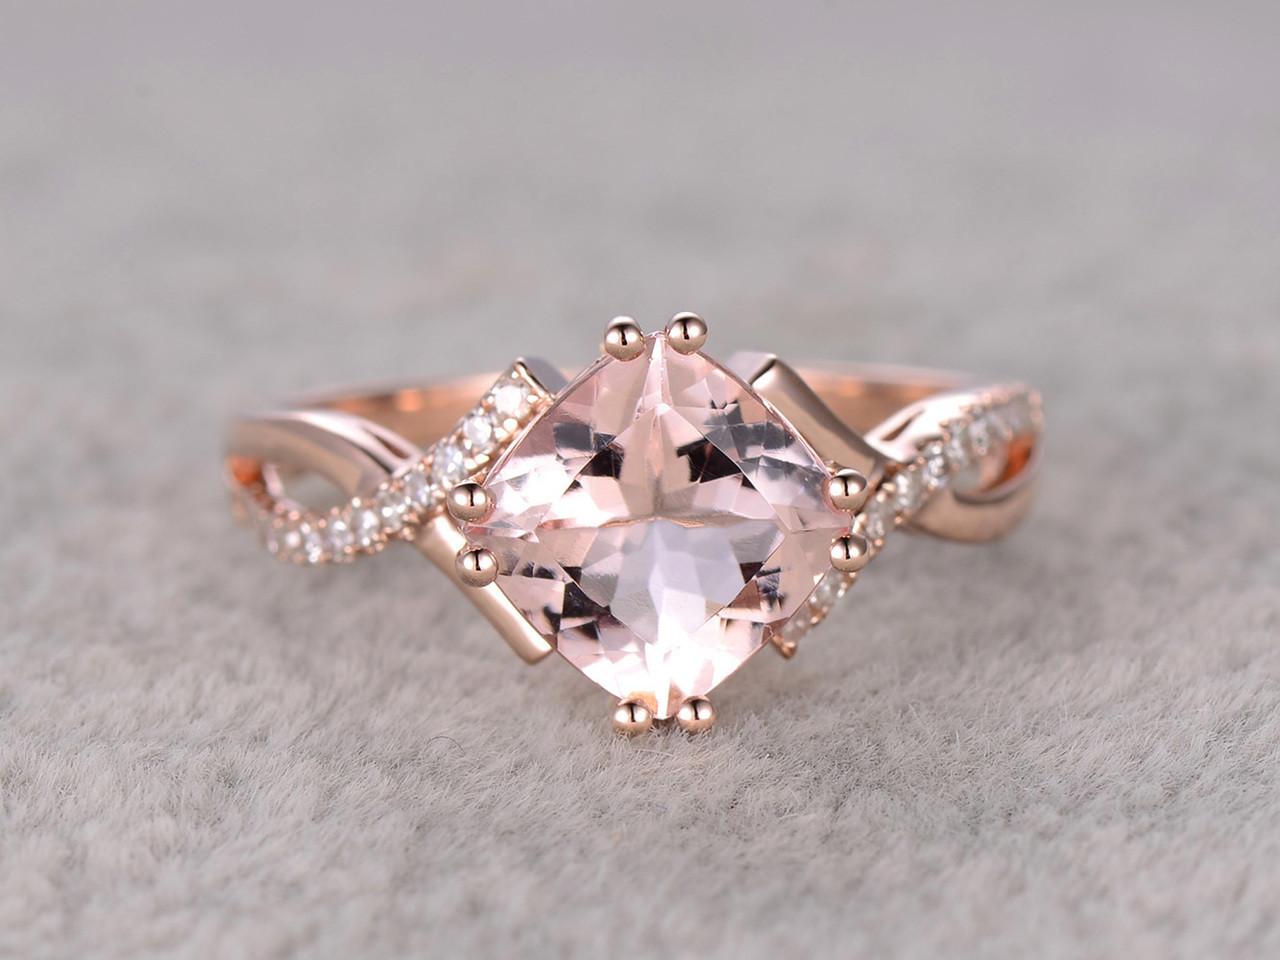 24 carat cushion cut morganite engagement ring diamond promise ring 14k rose gold split shank infinity - Morganite Wedding Rings